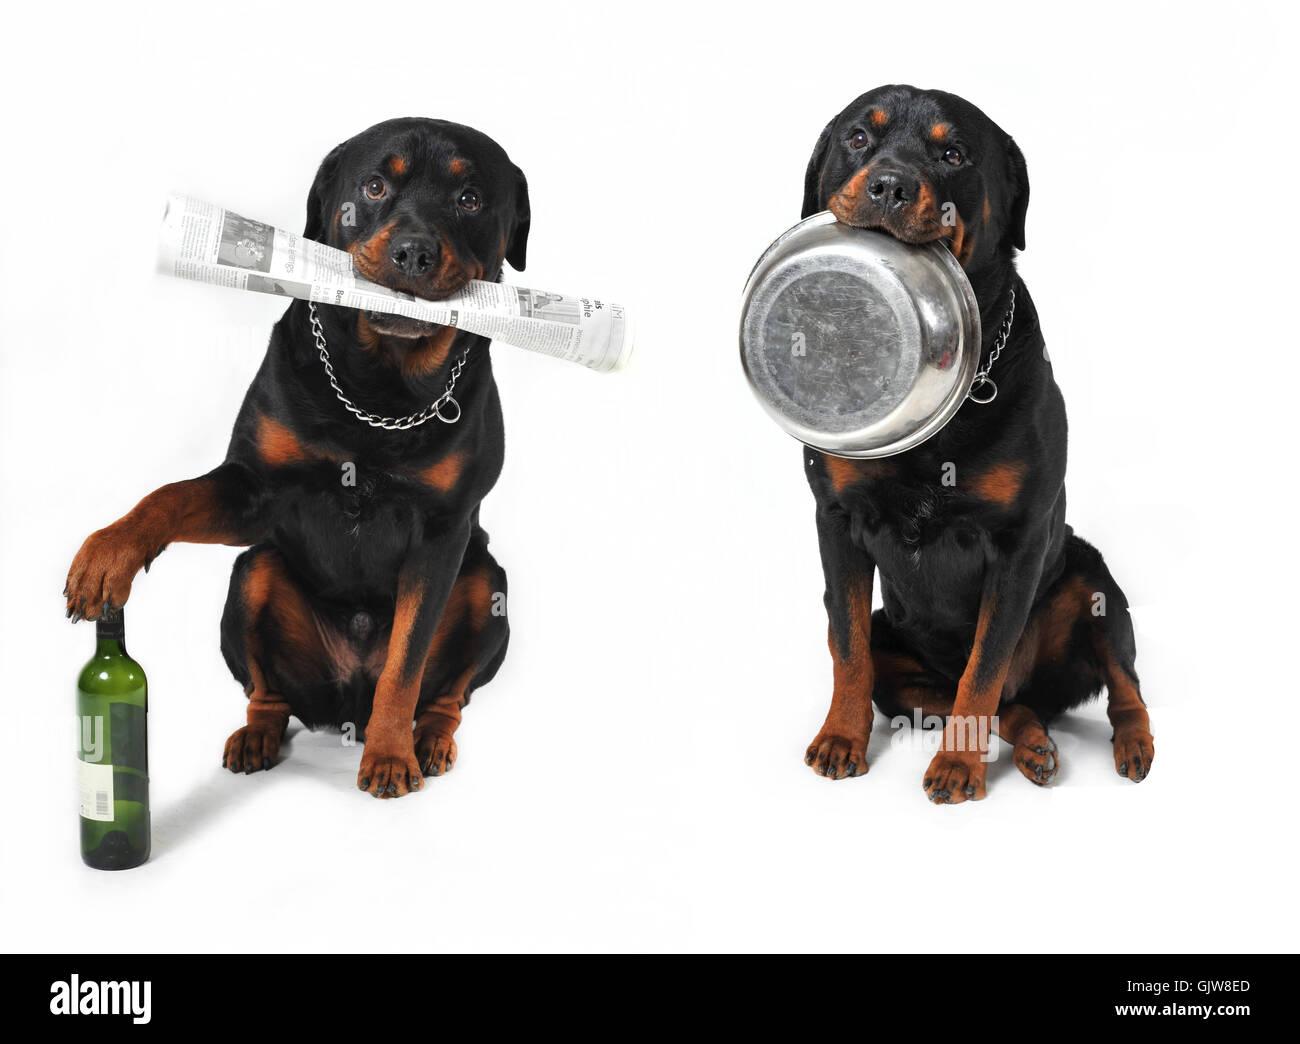 pet dog dogs - Stock Image